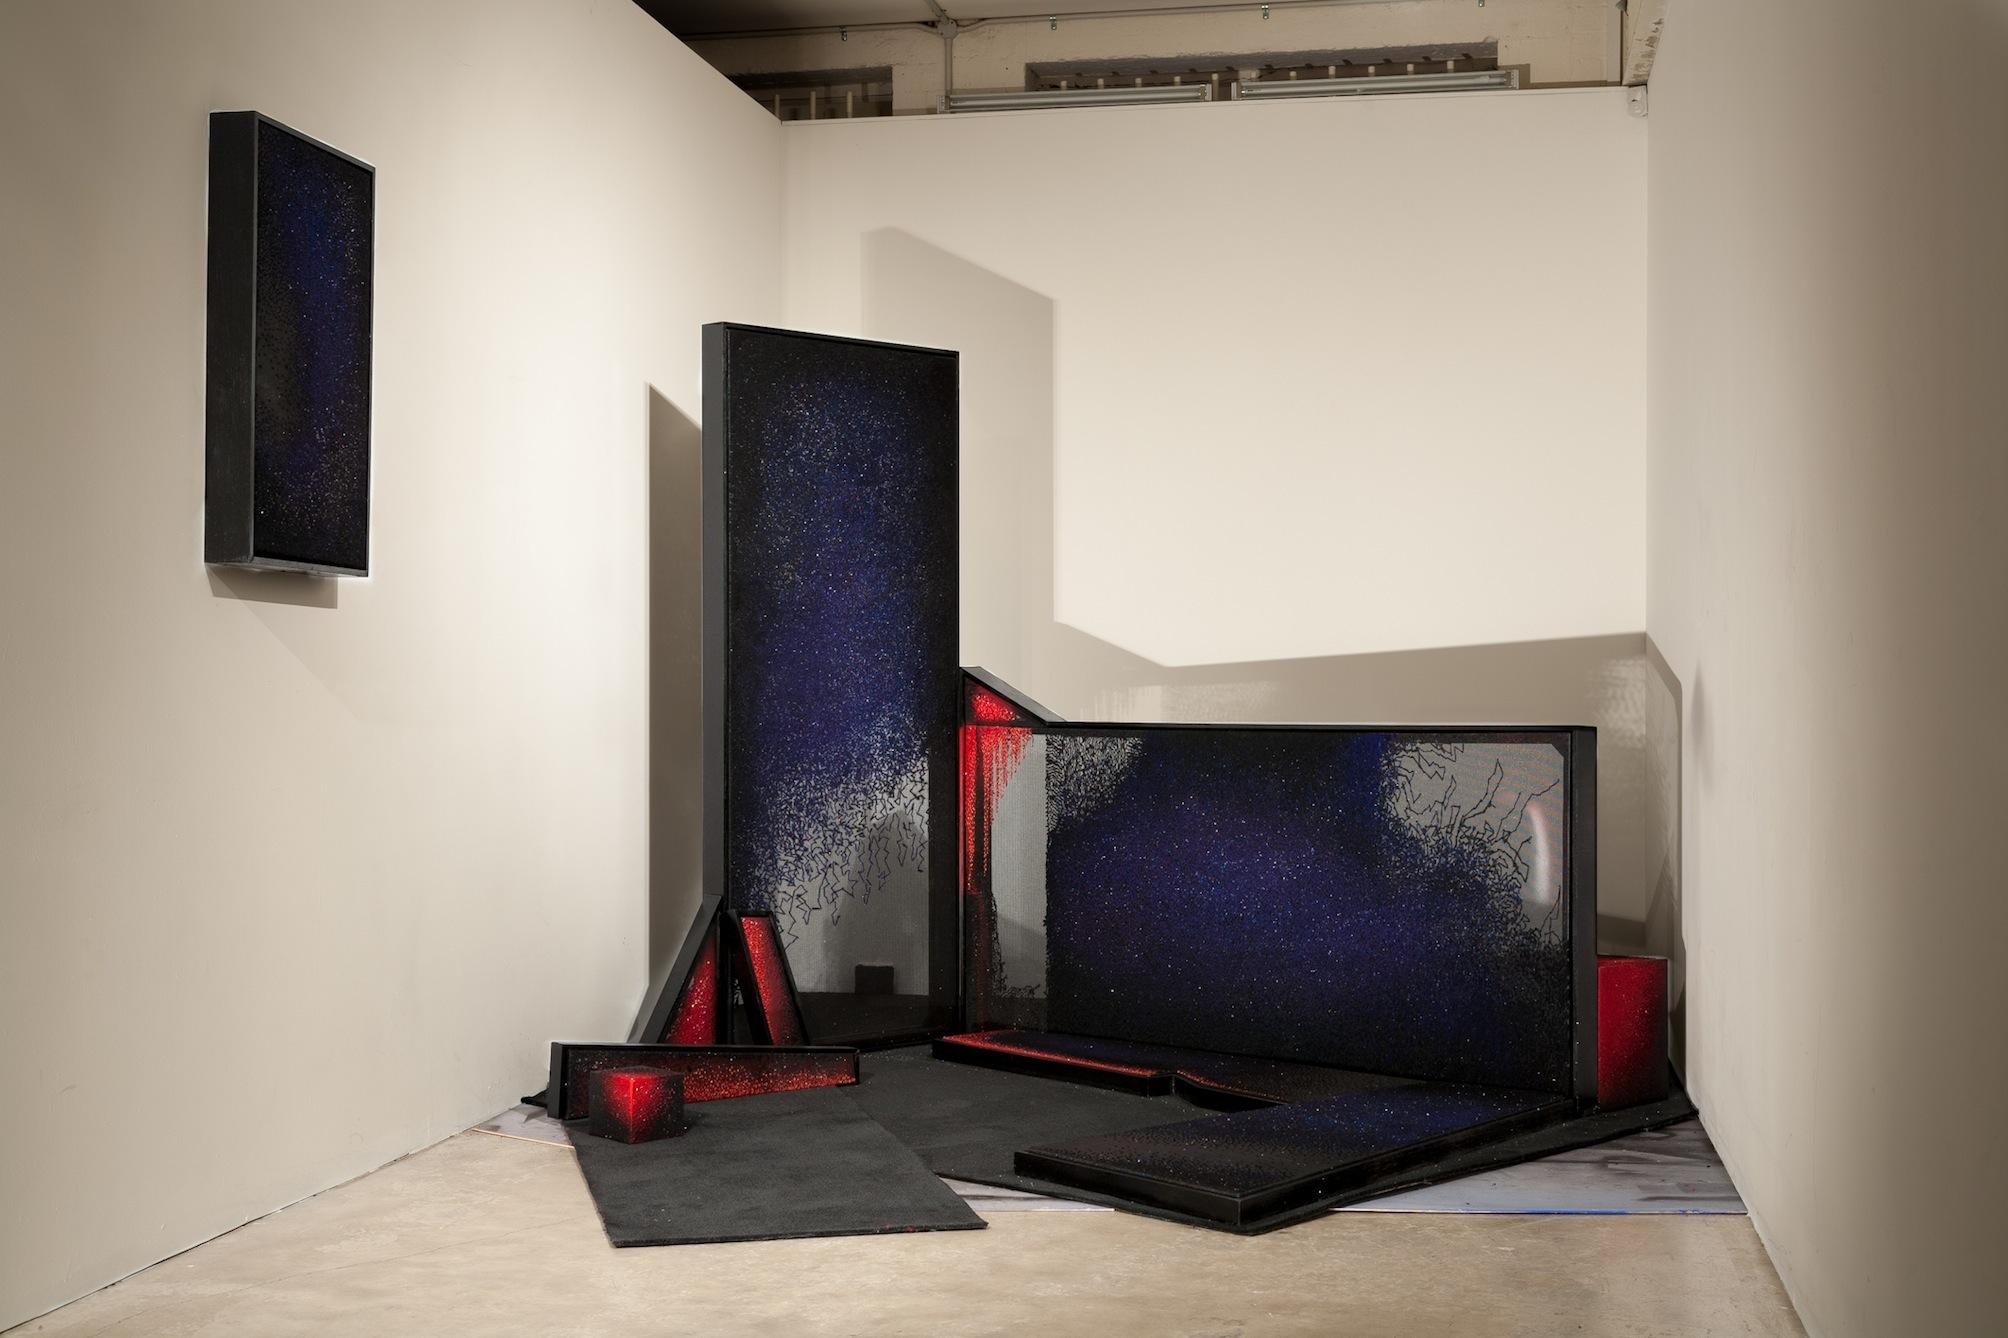 The Centre Doesn't Hold, 2014, Utopian Slumps Gallery, Melbourne, Photo Credit: Christo Crocker